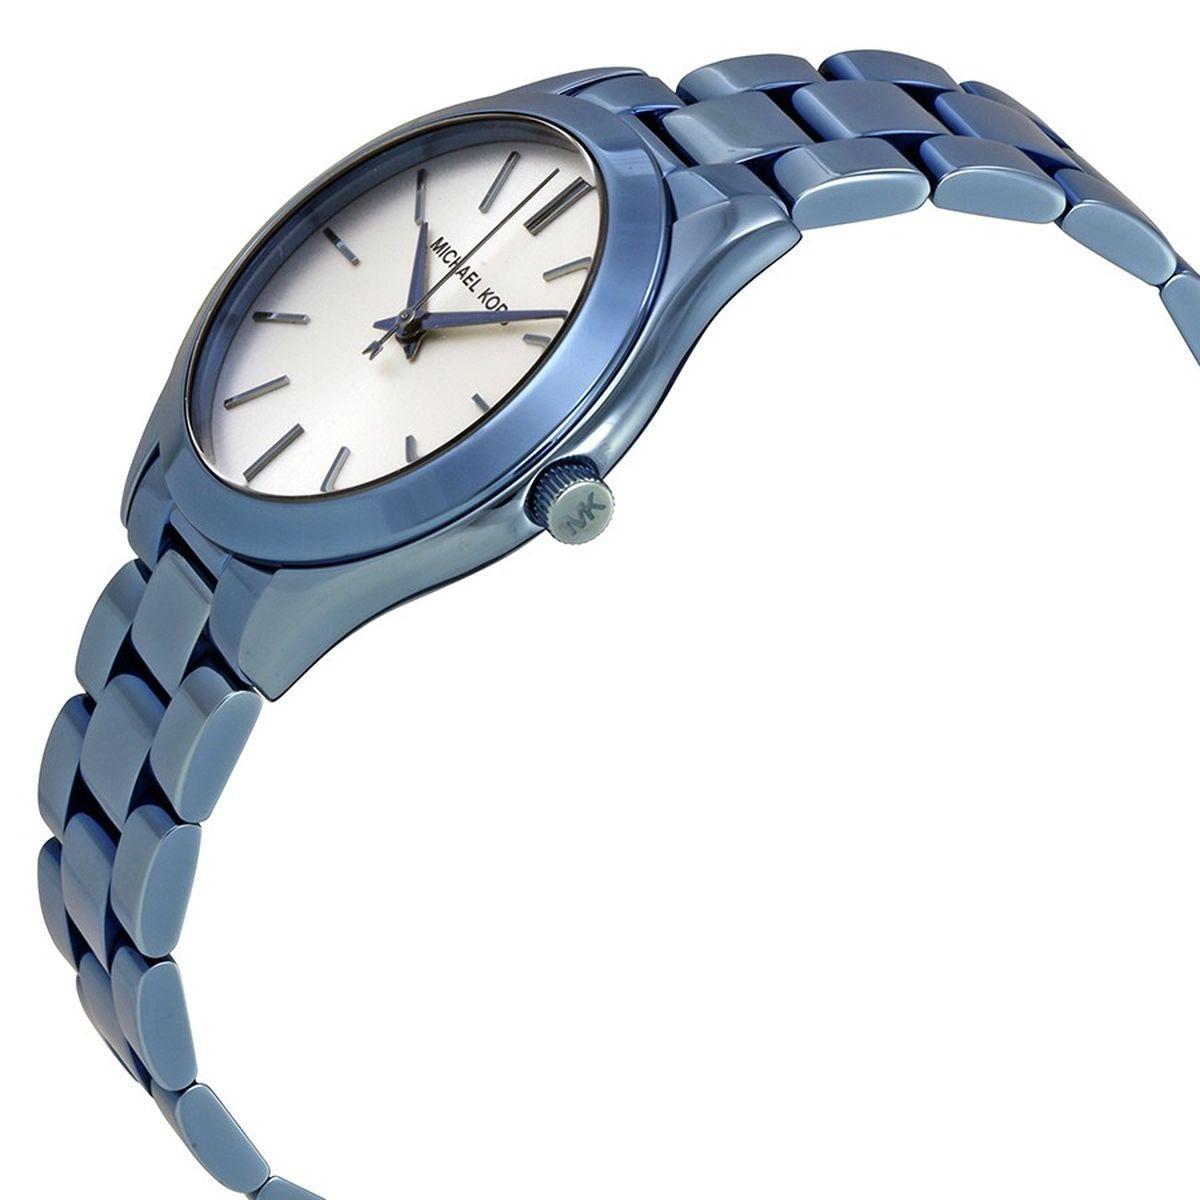 8af7c3ac7d6 Relógio michael kors feminino mk3674 - Relógio Feminino - Magazine Luiza